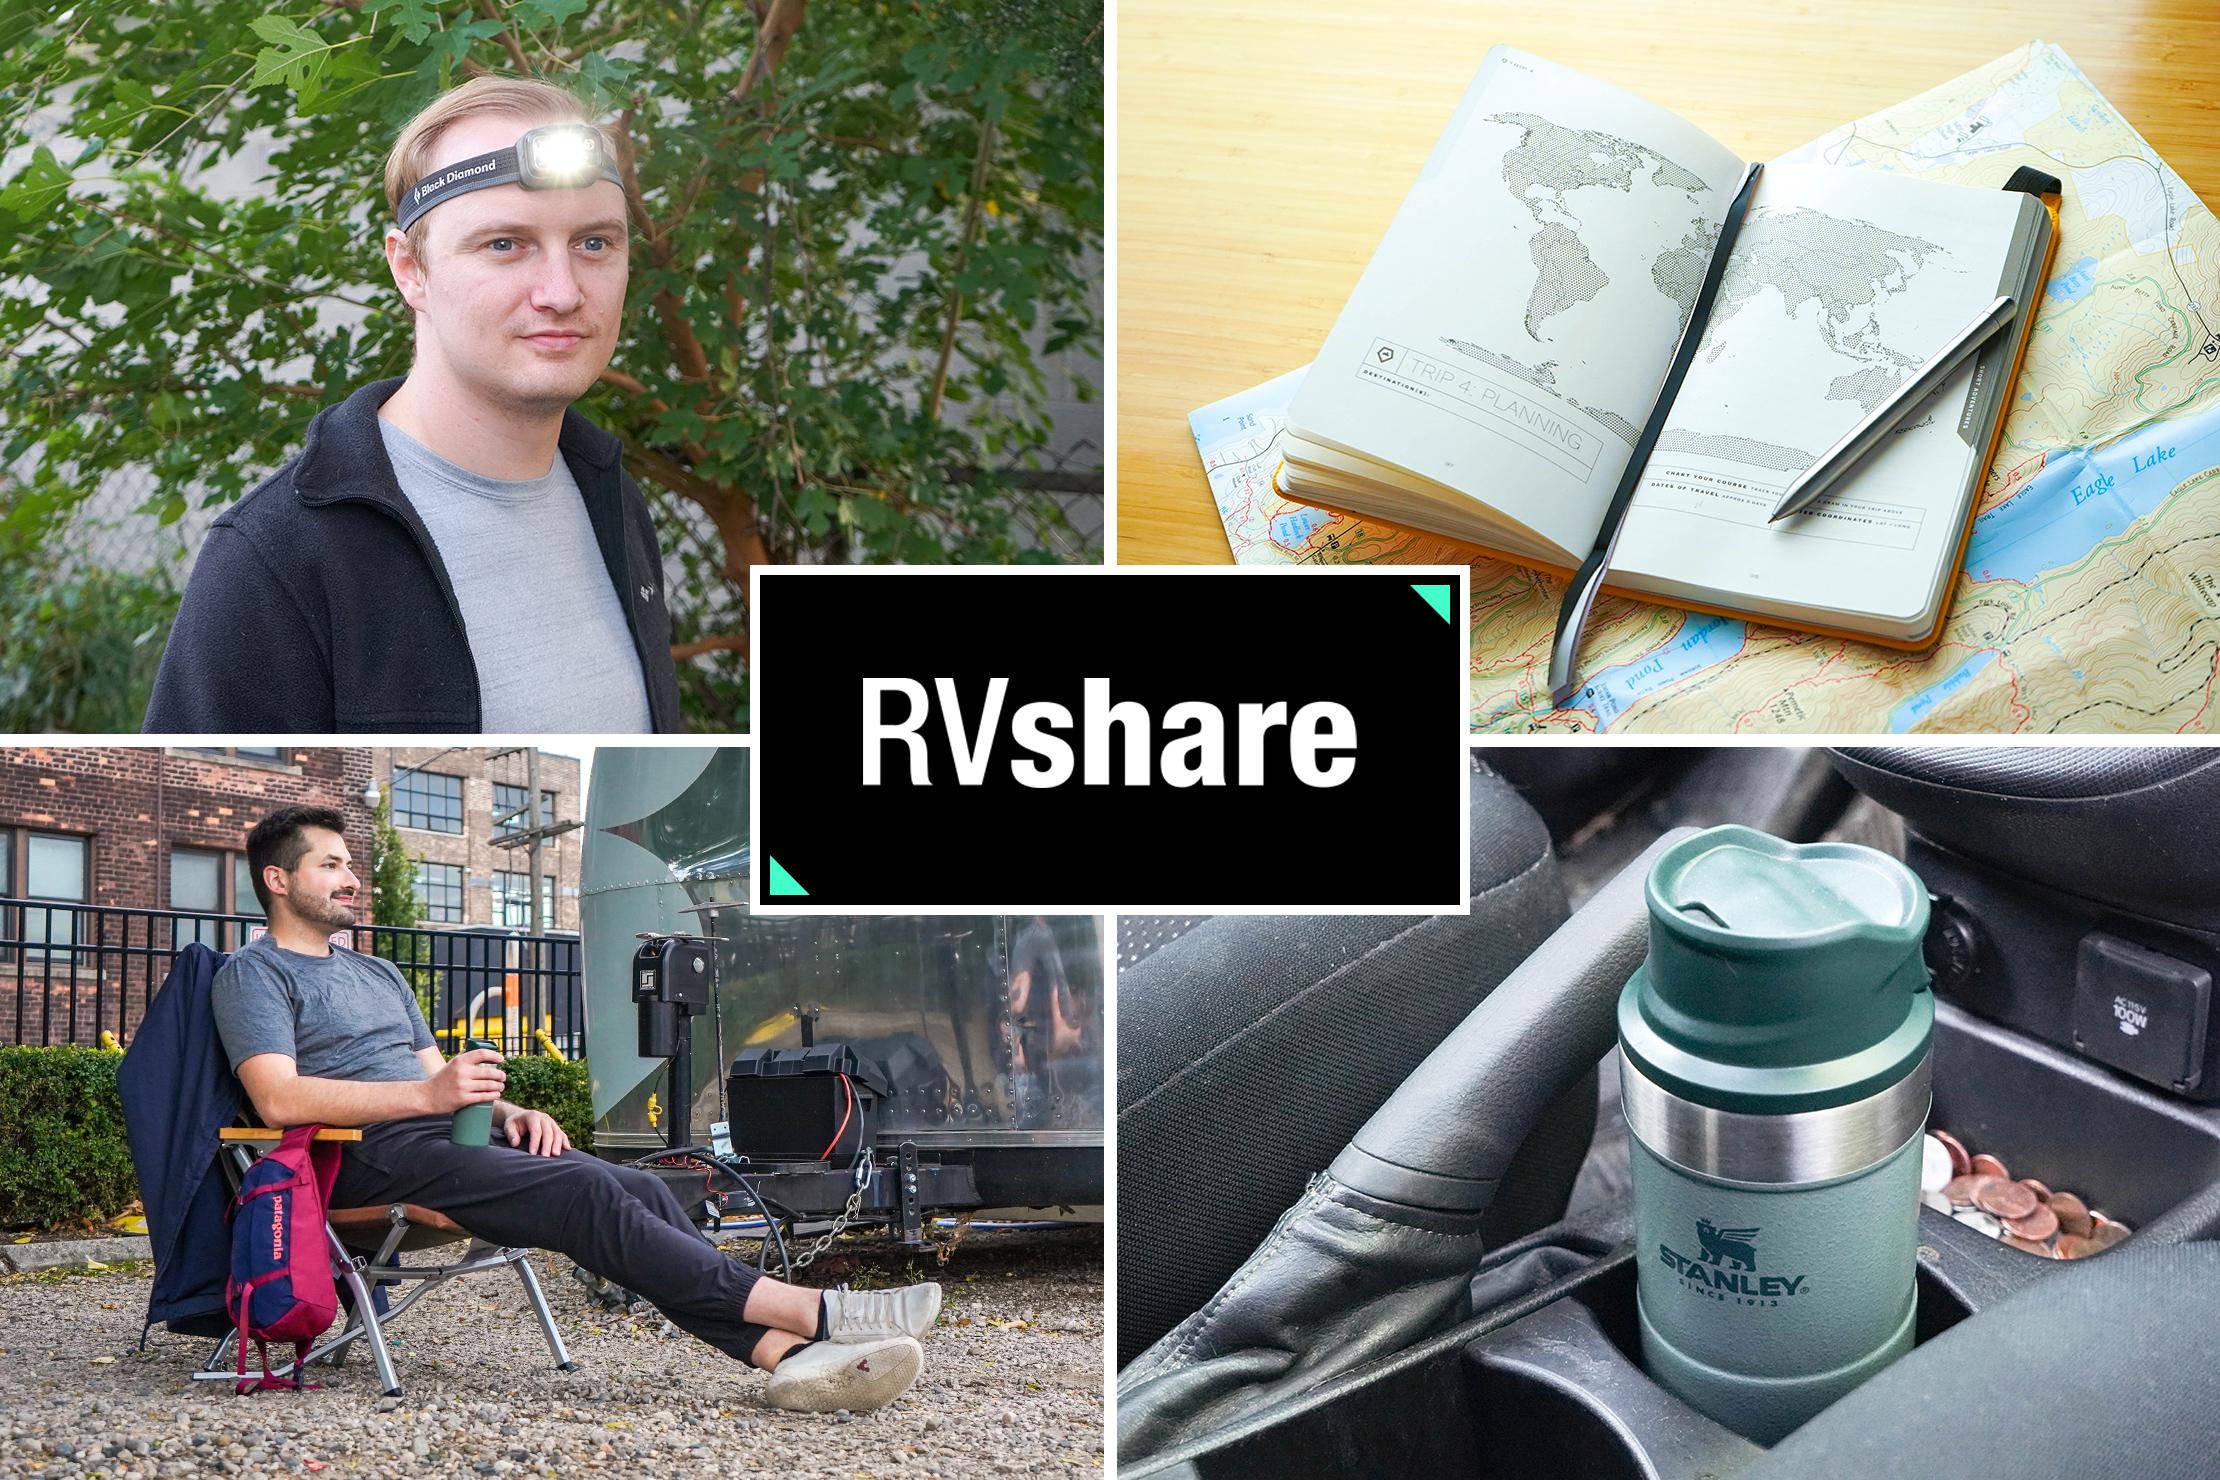 RVshare Road Trip Gift Ideas